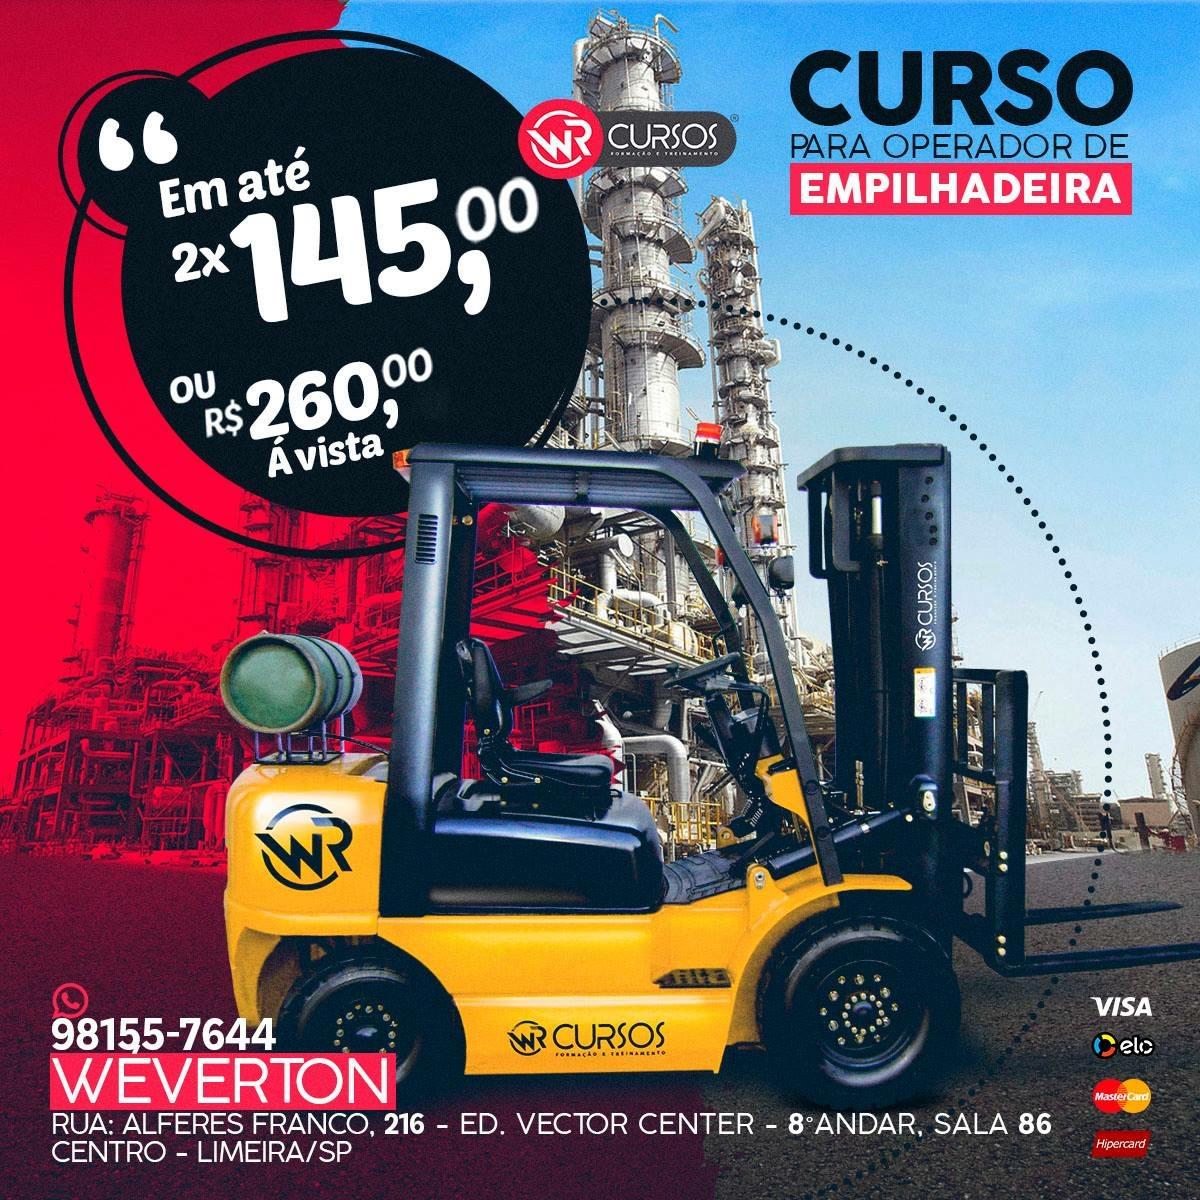 CURSO OPERADOR DE EMPILHADEIRA